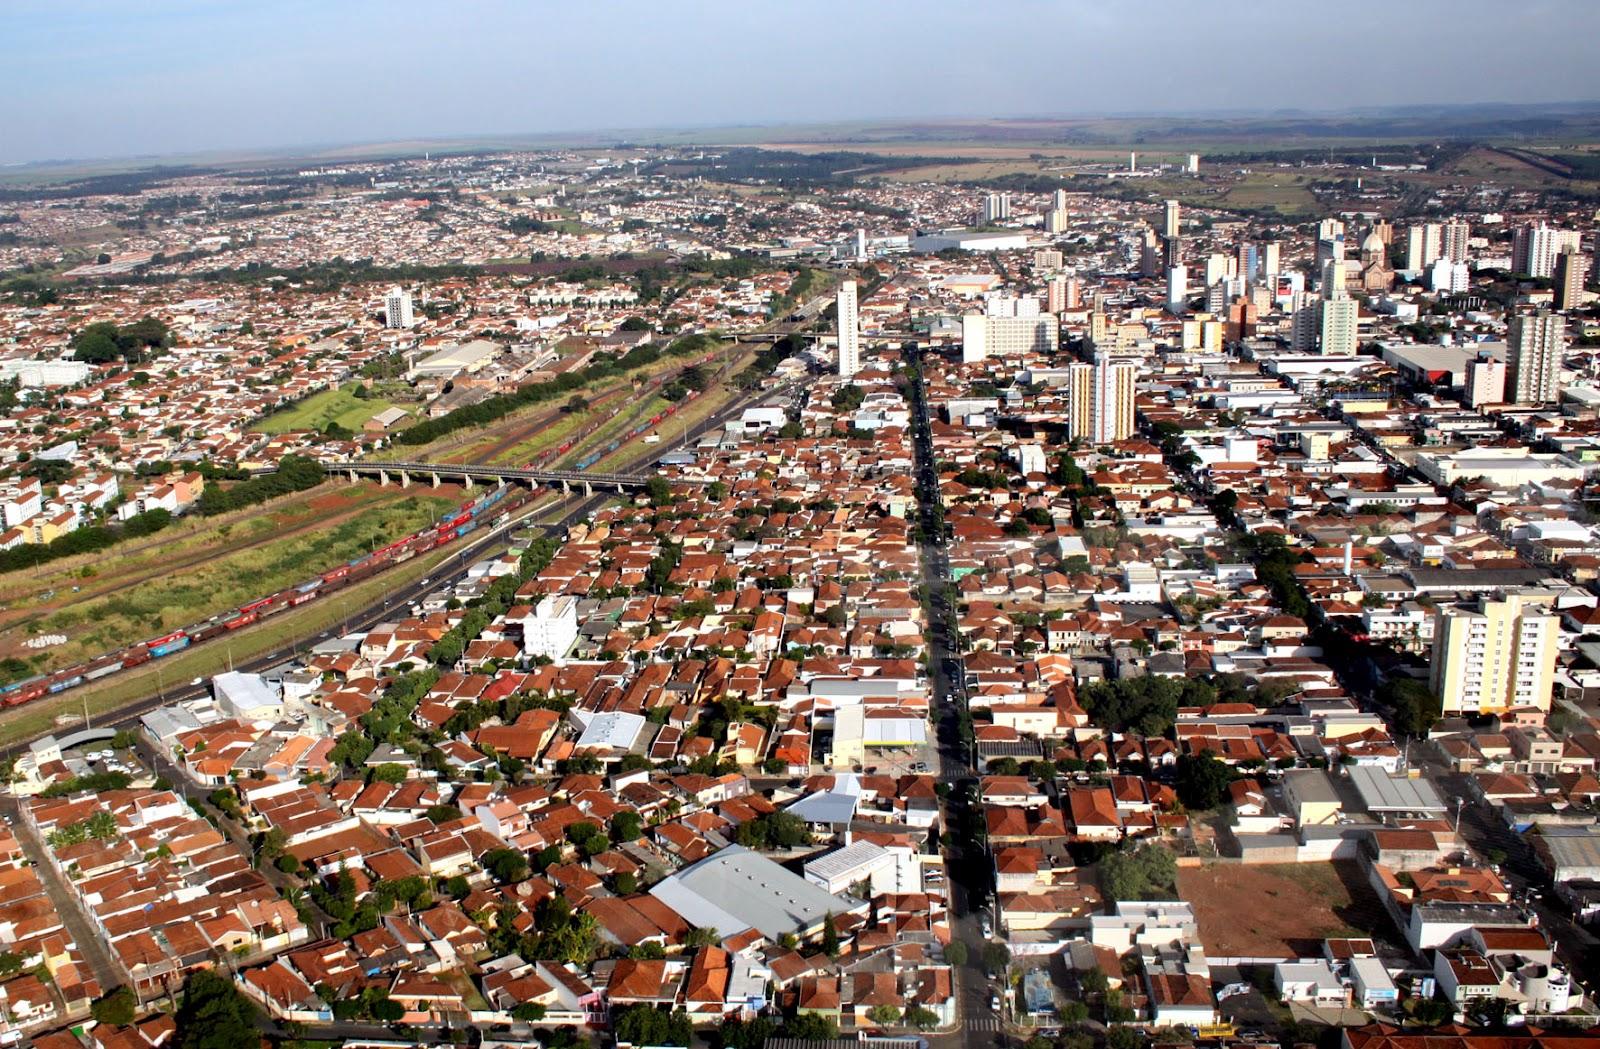 http://2.bp.blogspot.com/-9A9Kd5006bo/T716n6IR-jI/AAAAAAAAAGQ/_T_weDUmcPc/s1600/Foto+arquivo+Vista+geral+da+cidade+de+Araraquara+Foto+Sergio+Pierri.jpg